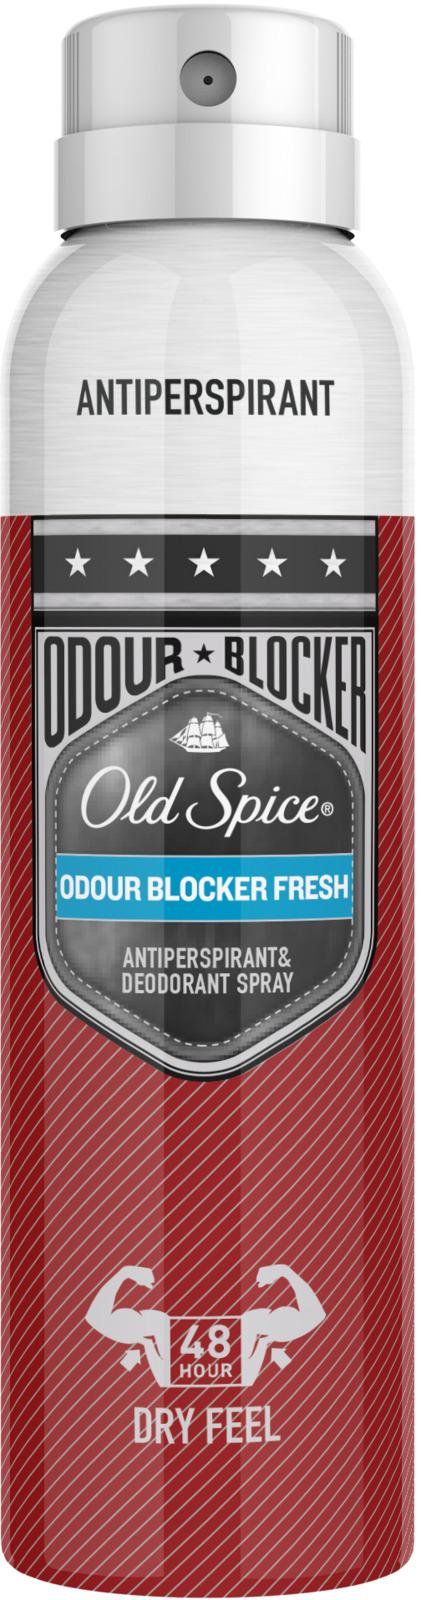 Дезодорант-антиперспирант аэрозольный Old Spice Odour Blocker Fresh, 150 мл